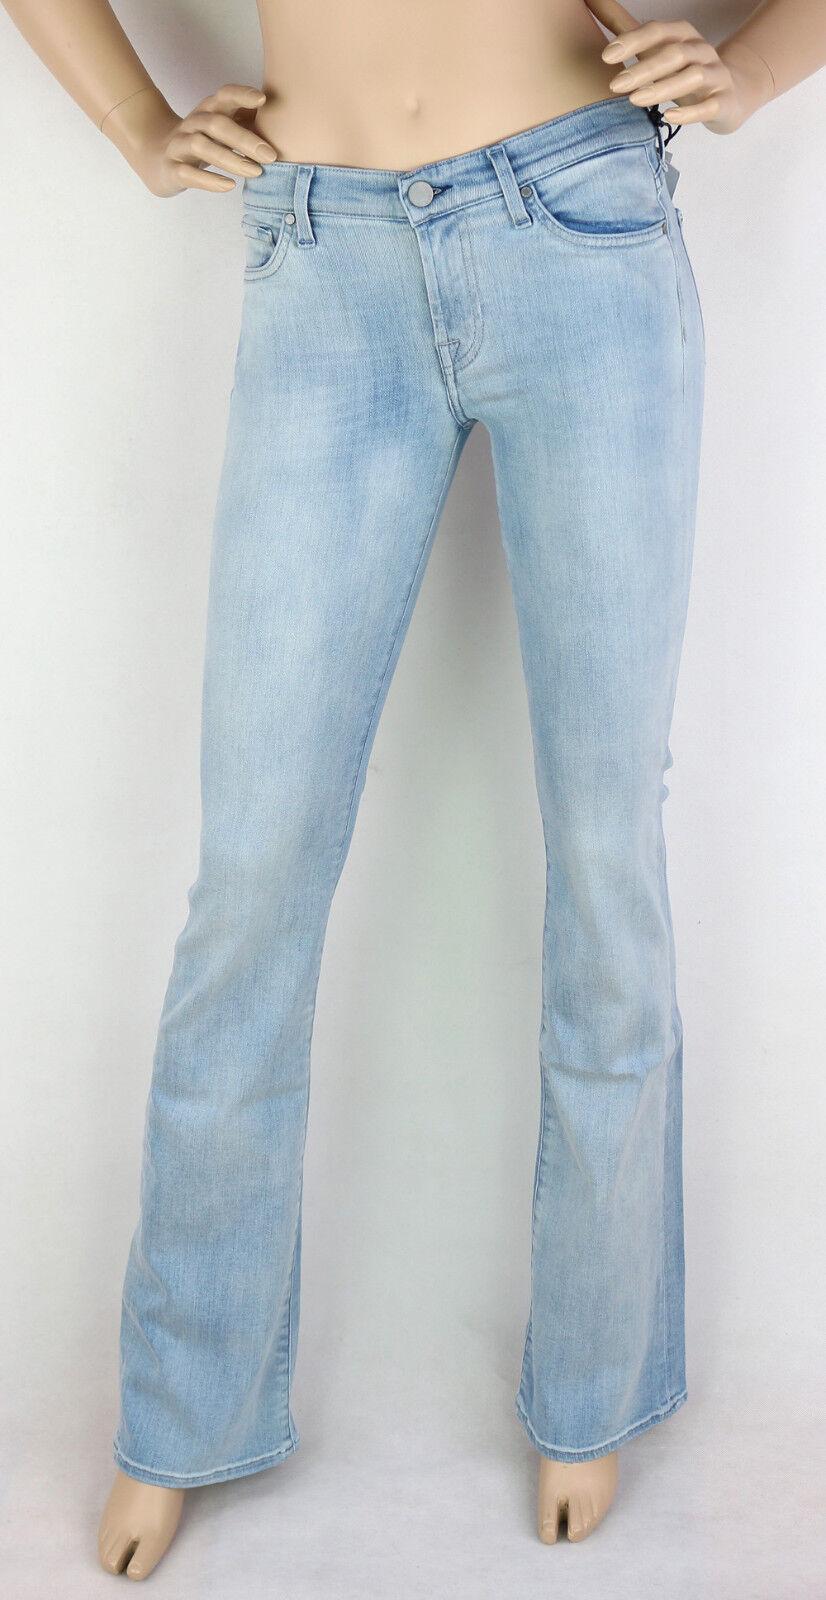 7 for all mankind Jeans Skinny Stiefelcut SlilliBayCor Light Blau W25